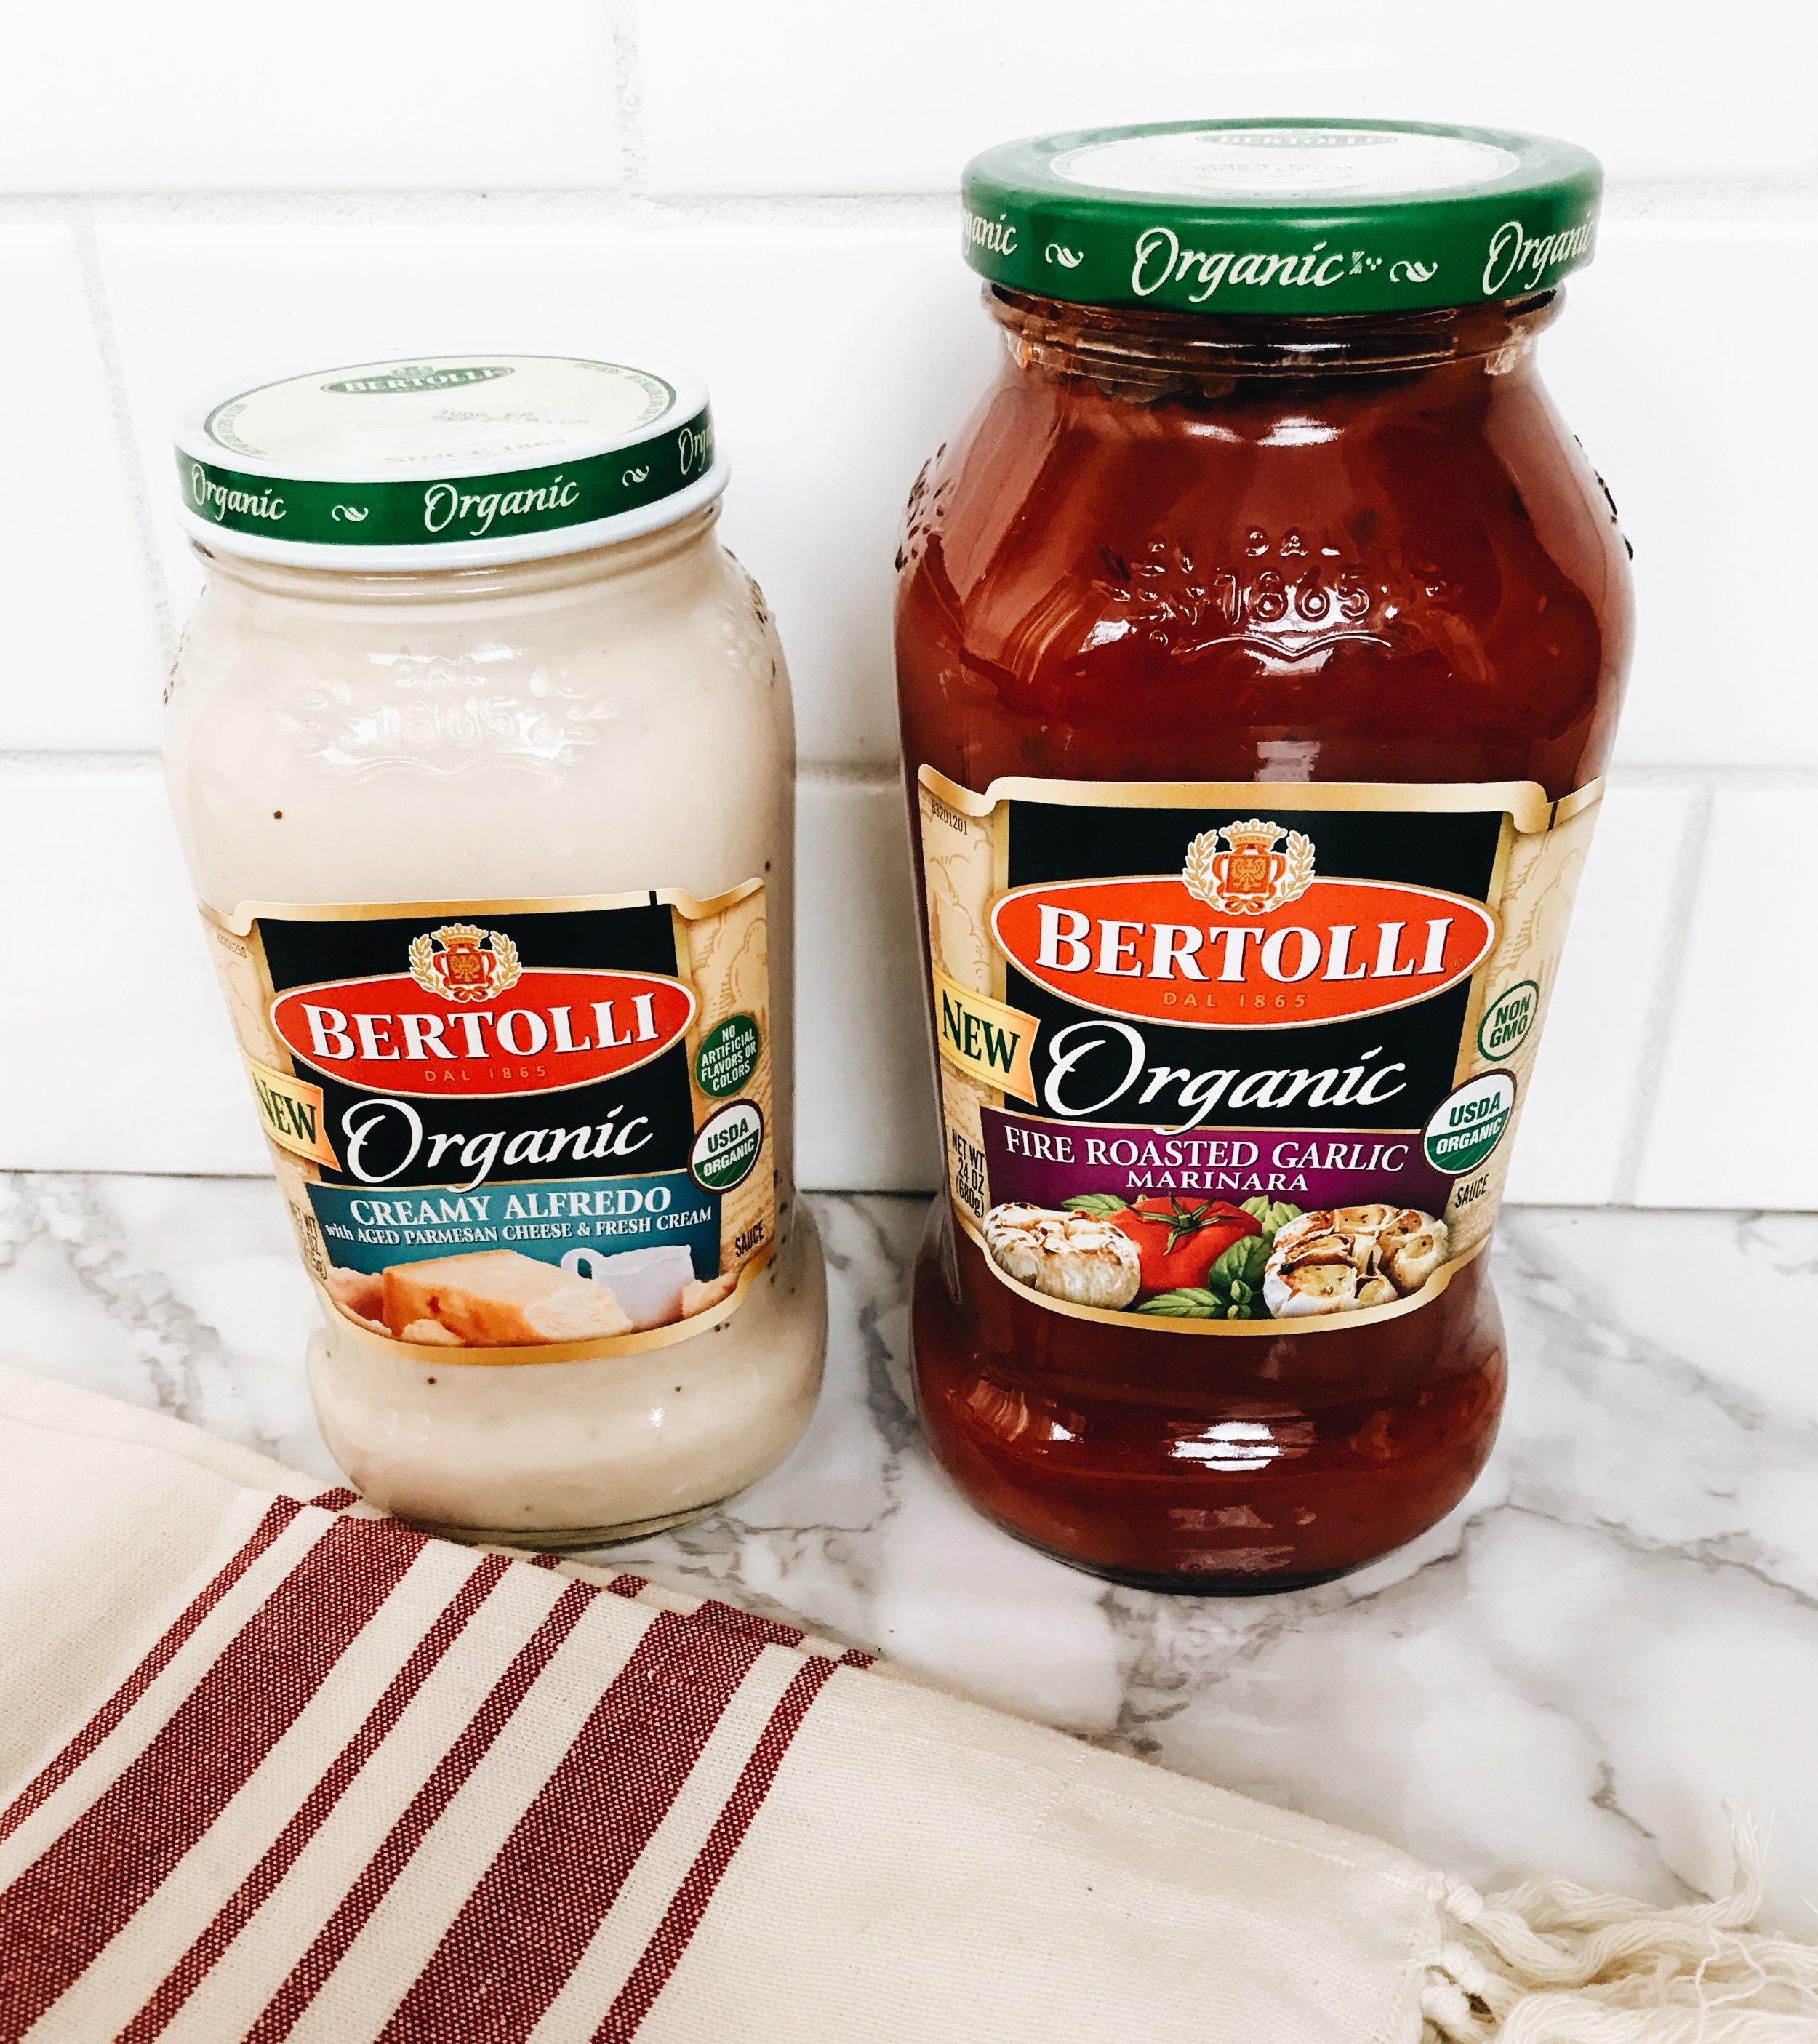 Bertolli Fettuccine Carbonara, Made With Bertolli Organic Creamy Alfredo Sauce #ad #sponsored #Bertolli #carbonara